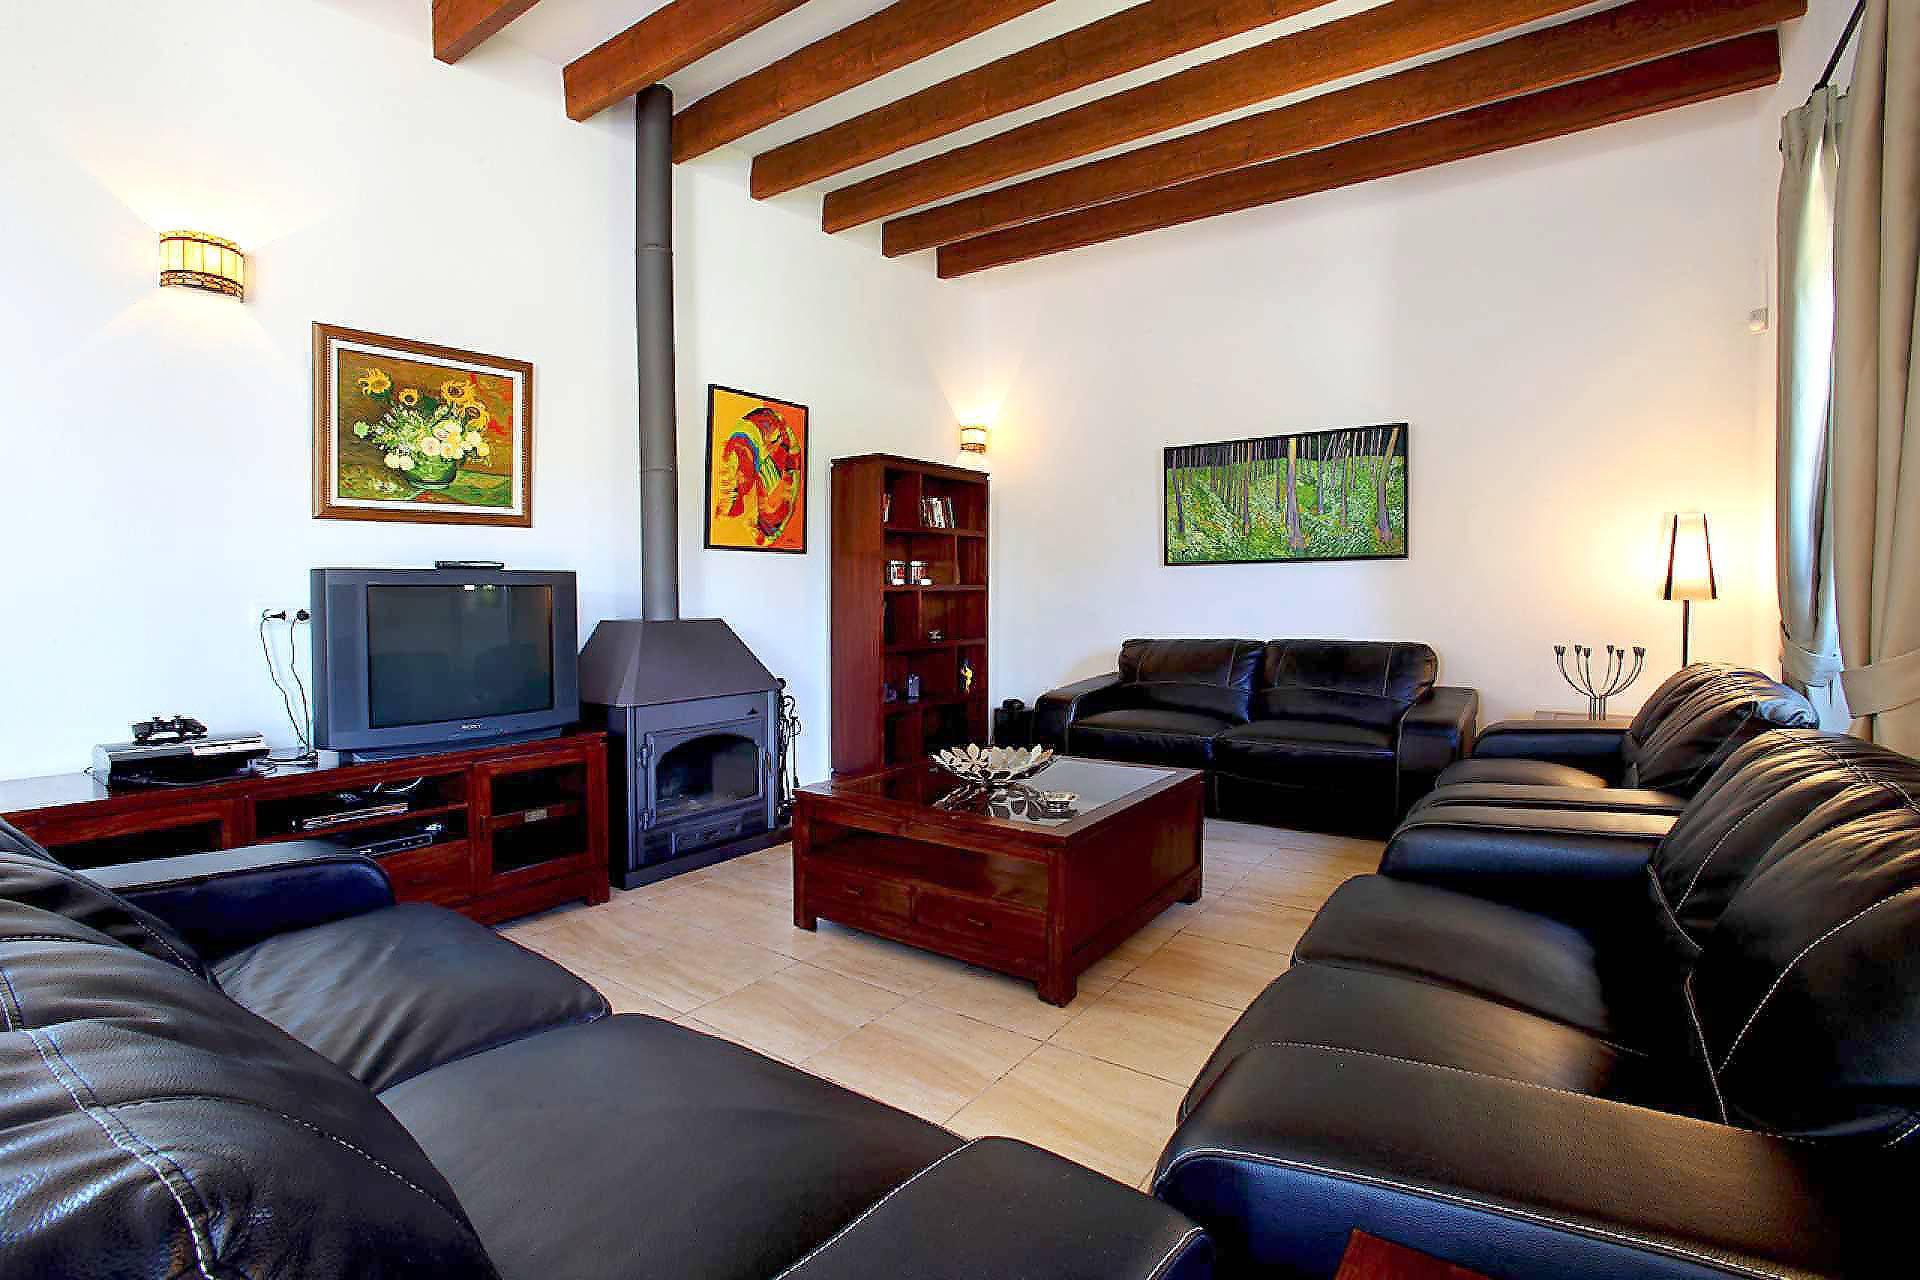 01-33 Großzügiges Ferienhaus Mallorca Osten Bild 15